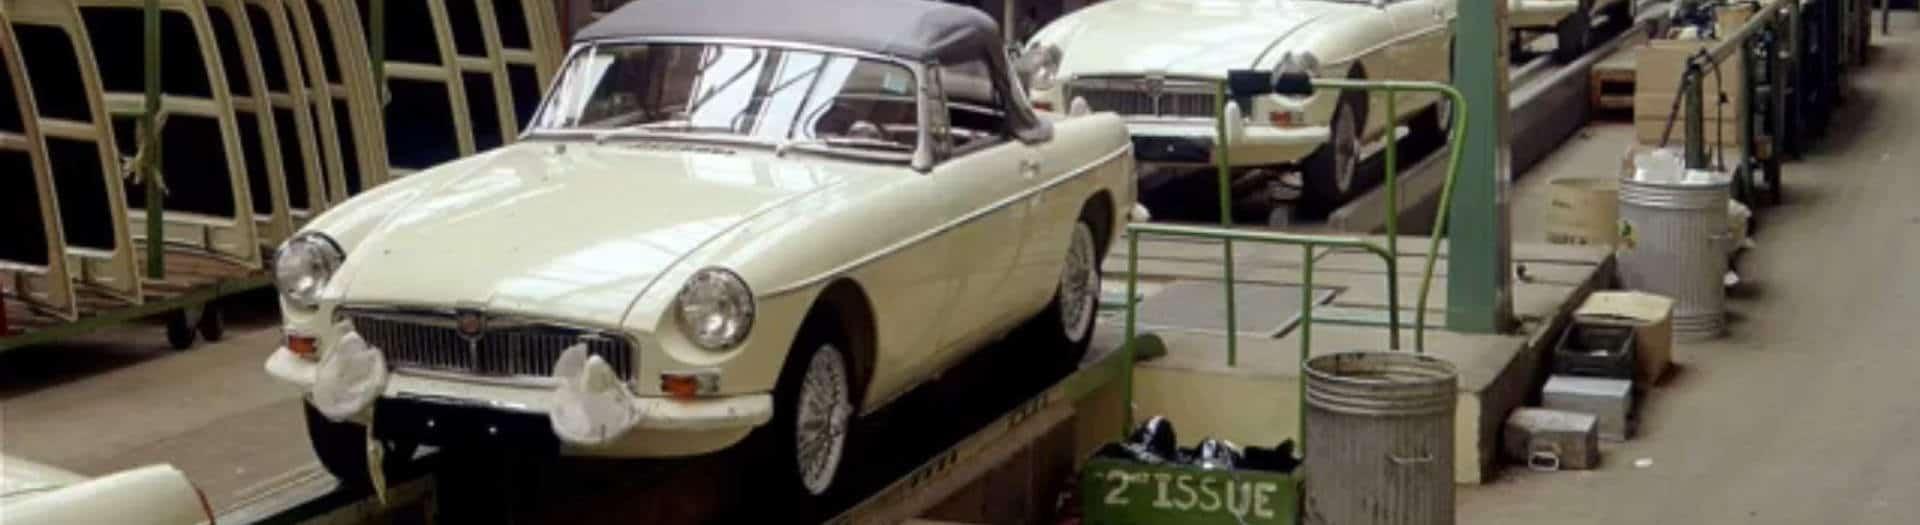 British car industry header 1920 x 525